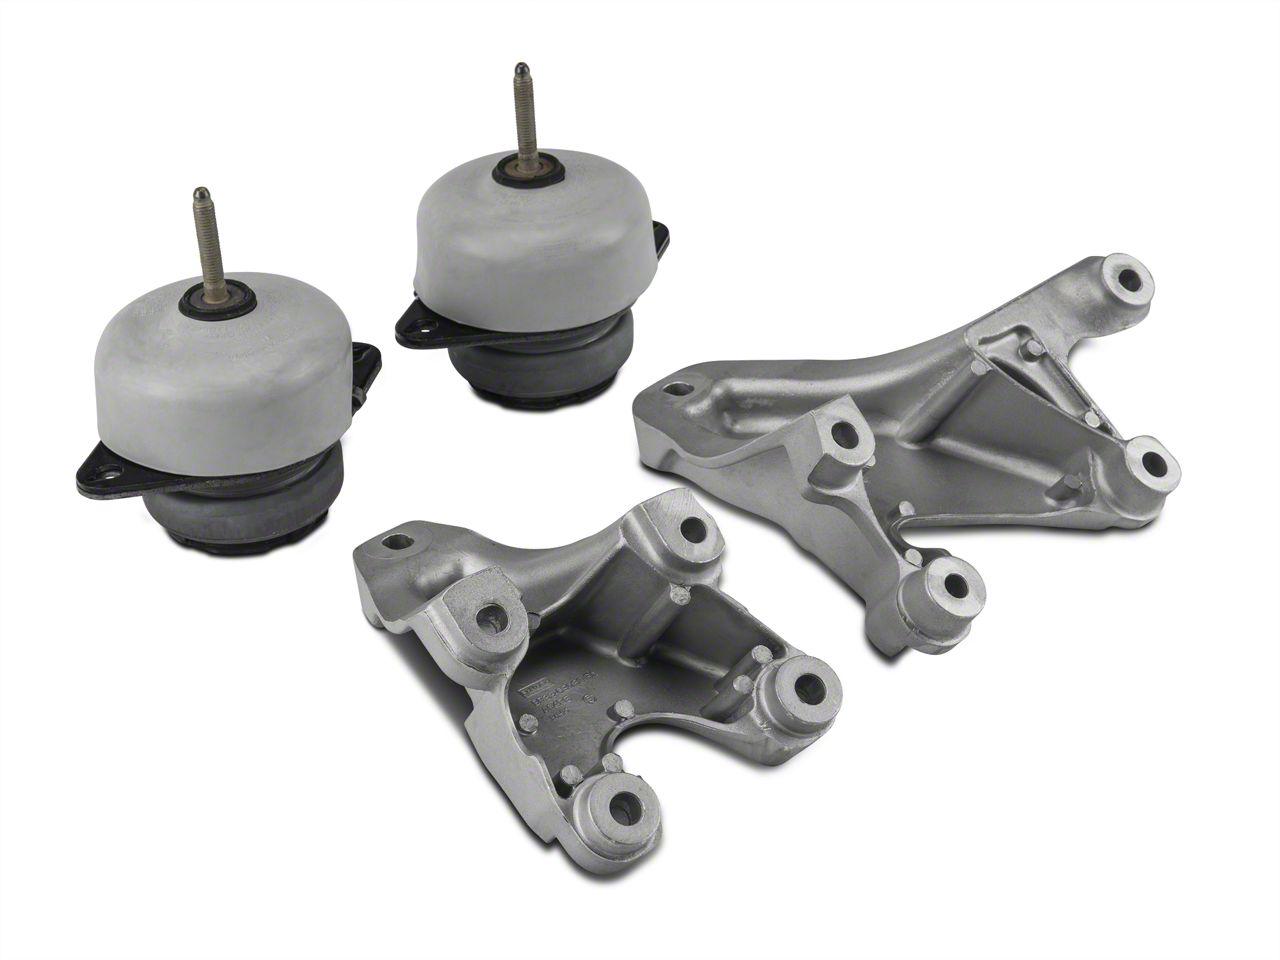 Ford Performance Motor Mount Kit (11-19 GT)